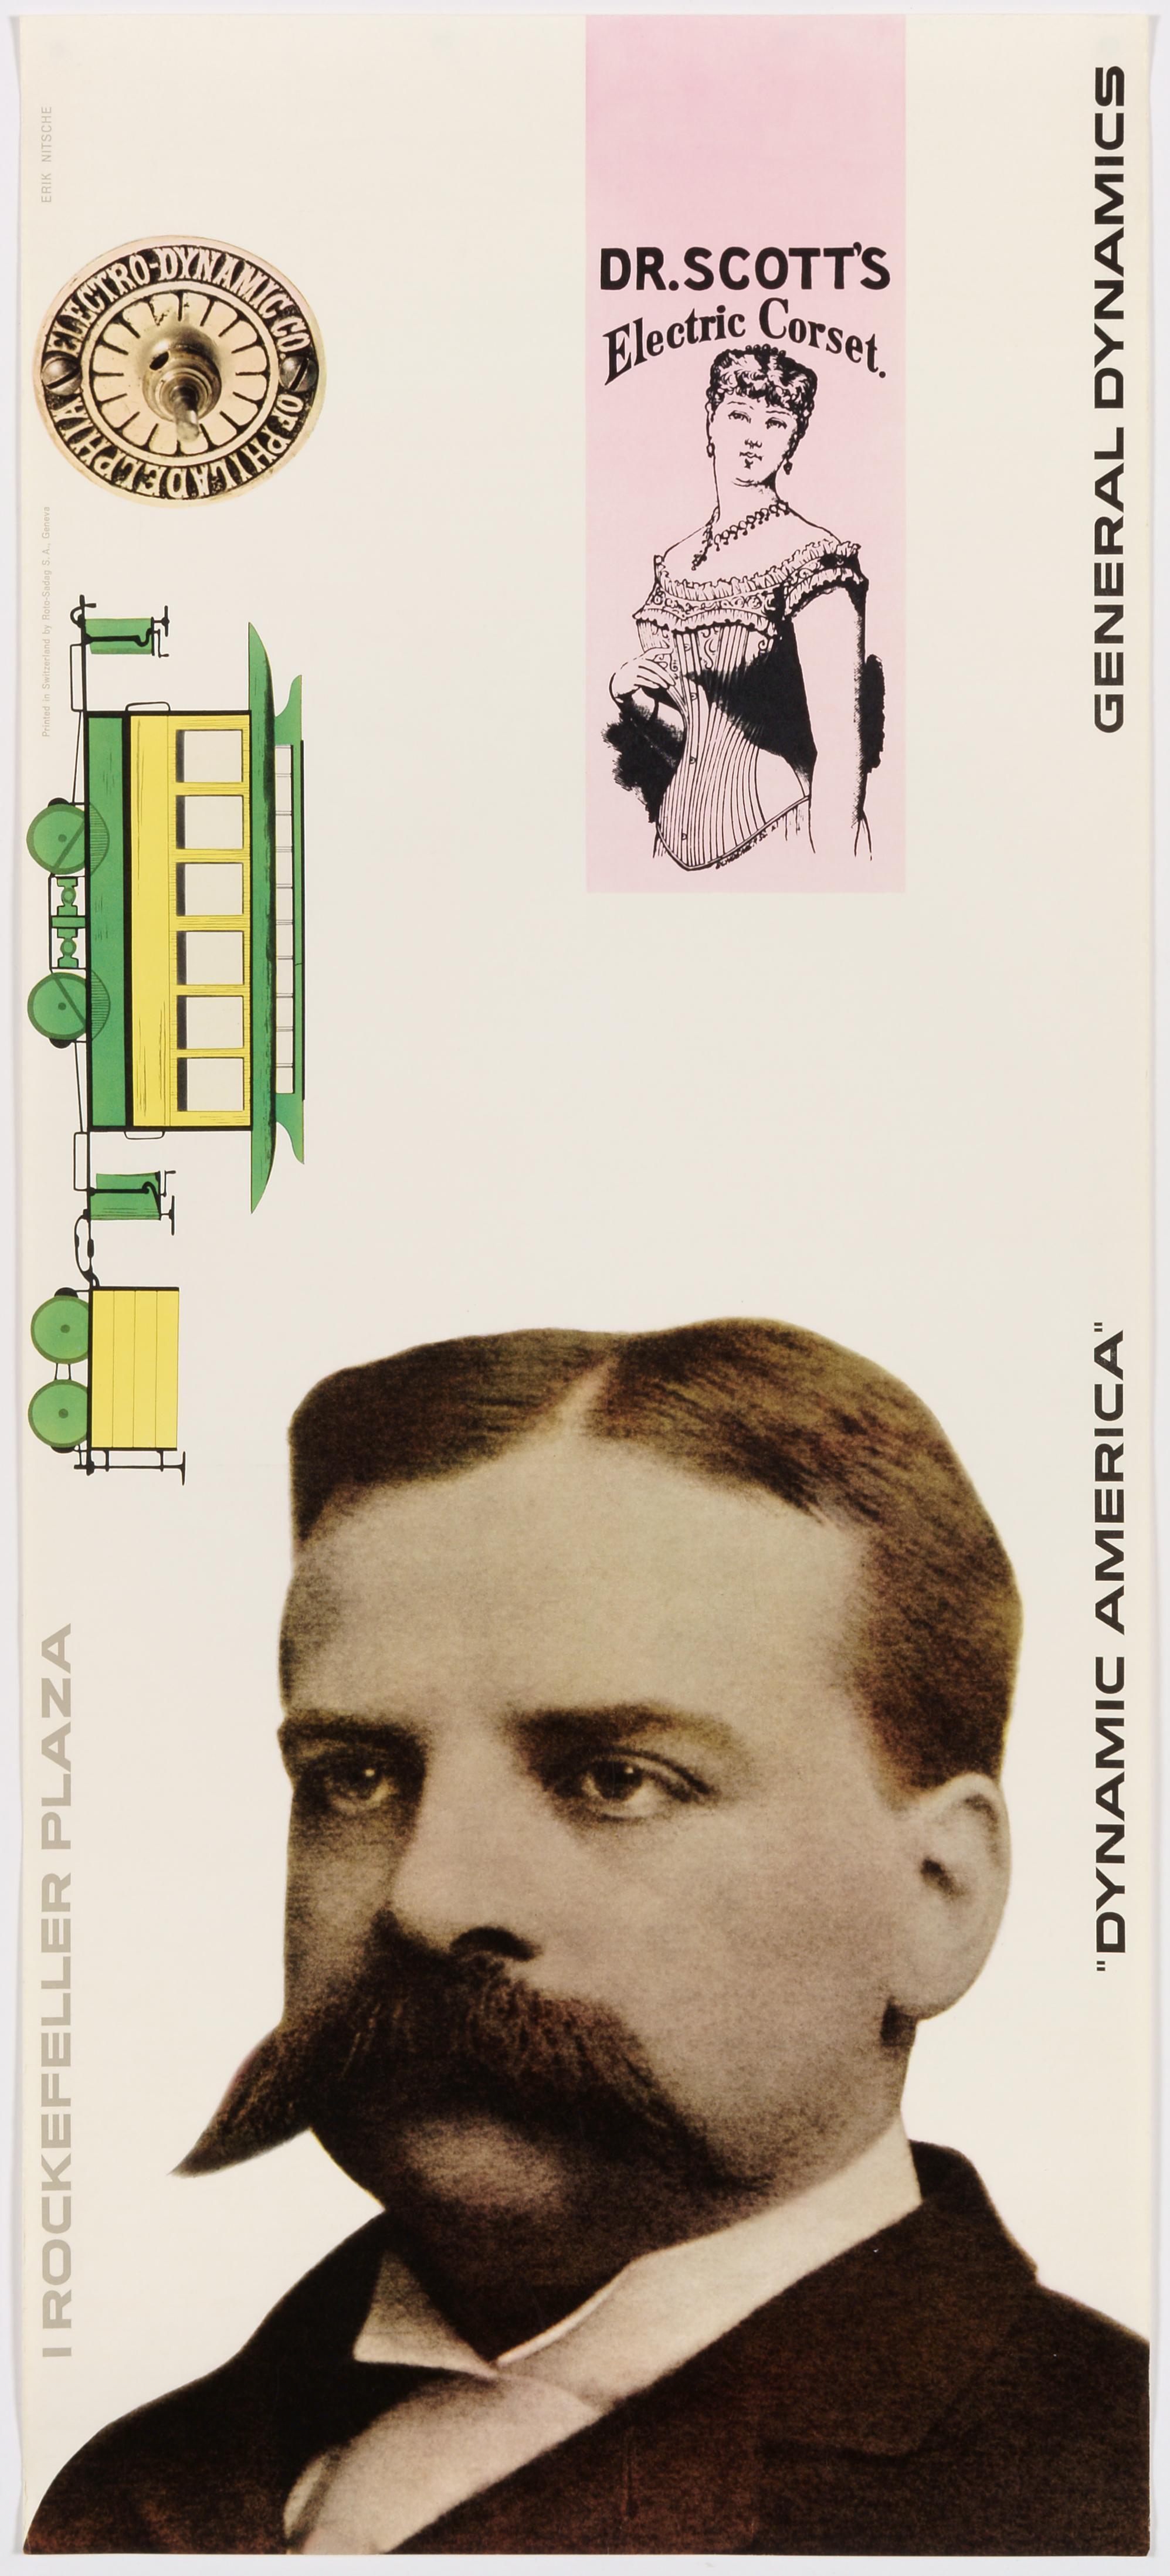 General Dynamics, Exhibition Dynamic America, New York; Original Vintage Poster